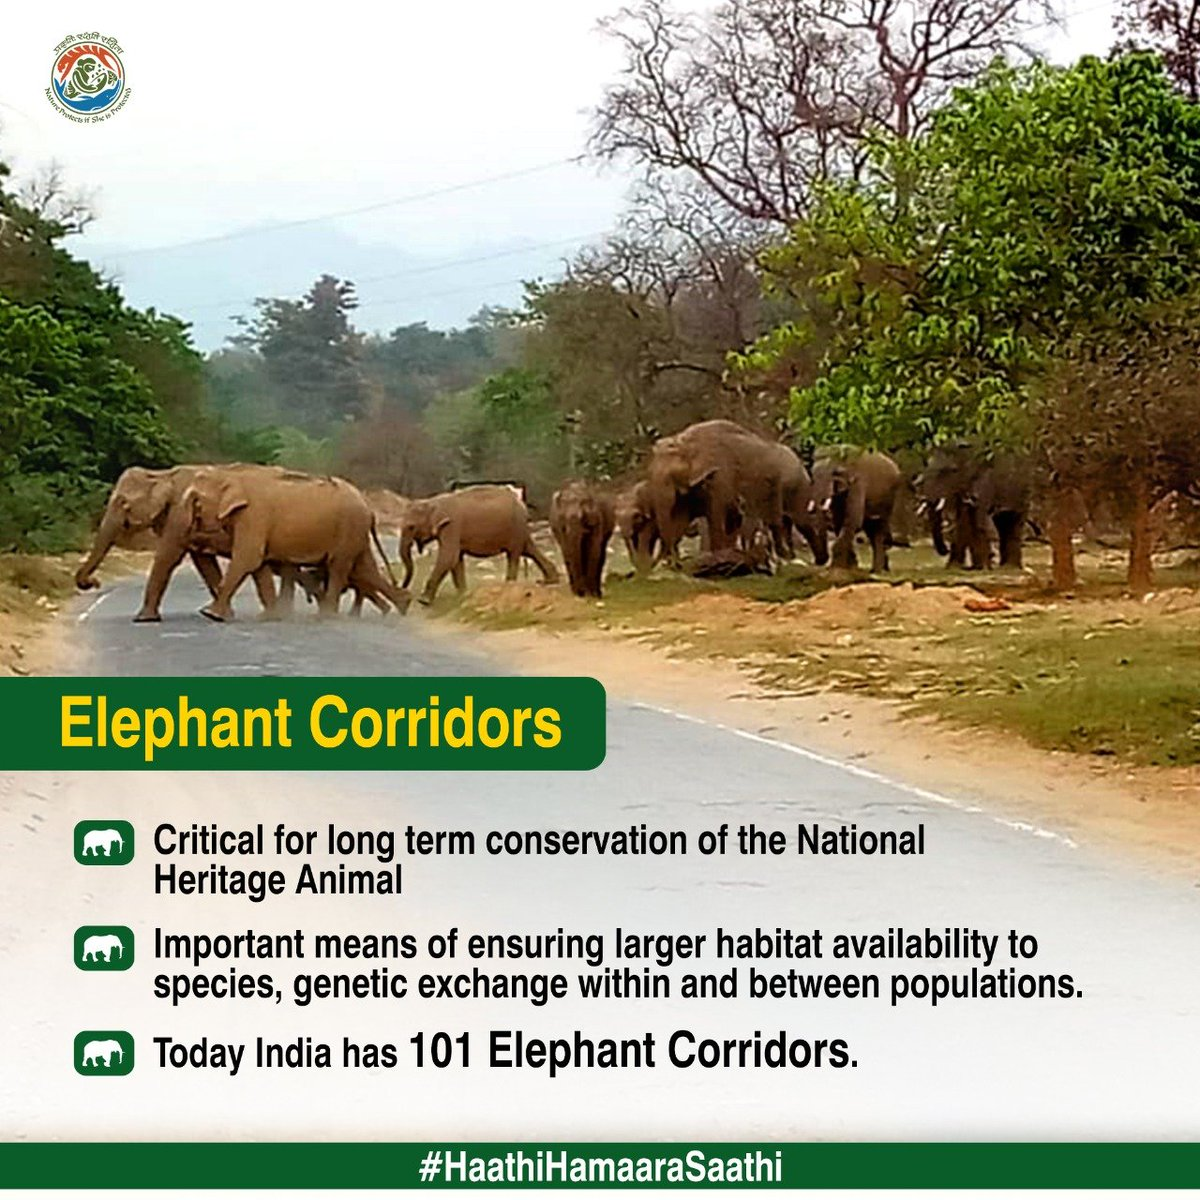 #HaathiHamaaraSaathi 🐘India has 60% of global Asian Elephant population 🐘India has established 30 Elephant sancuries & 101 Elephant Corridors in India. #WorldElephantDay2020 https://t.co/62y7bRYfrT